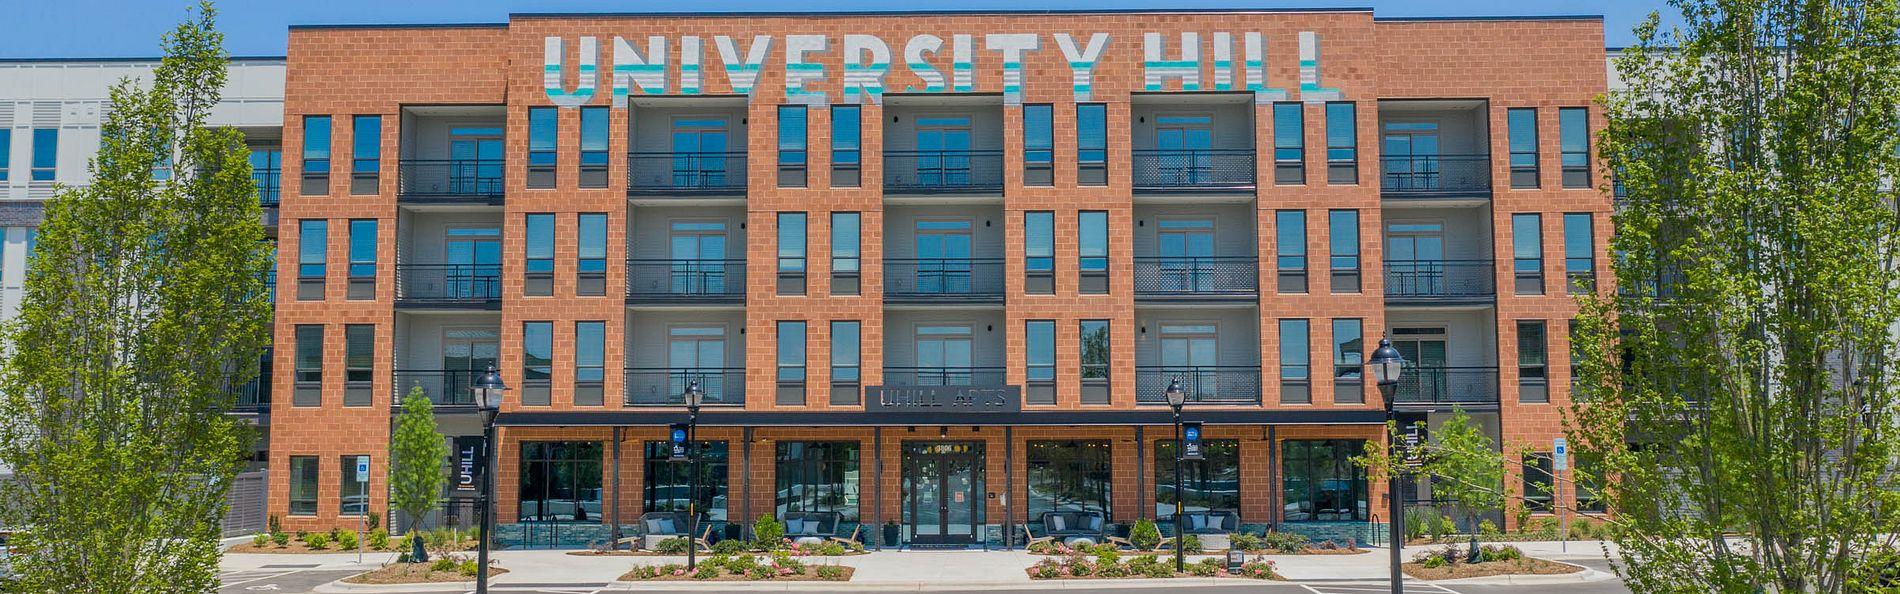 University Hill Exterior